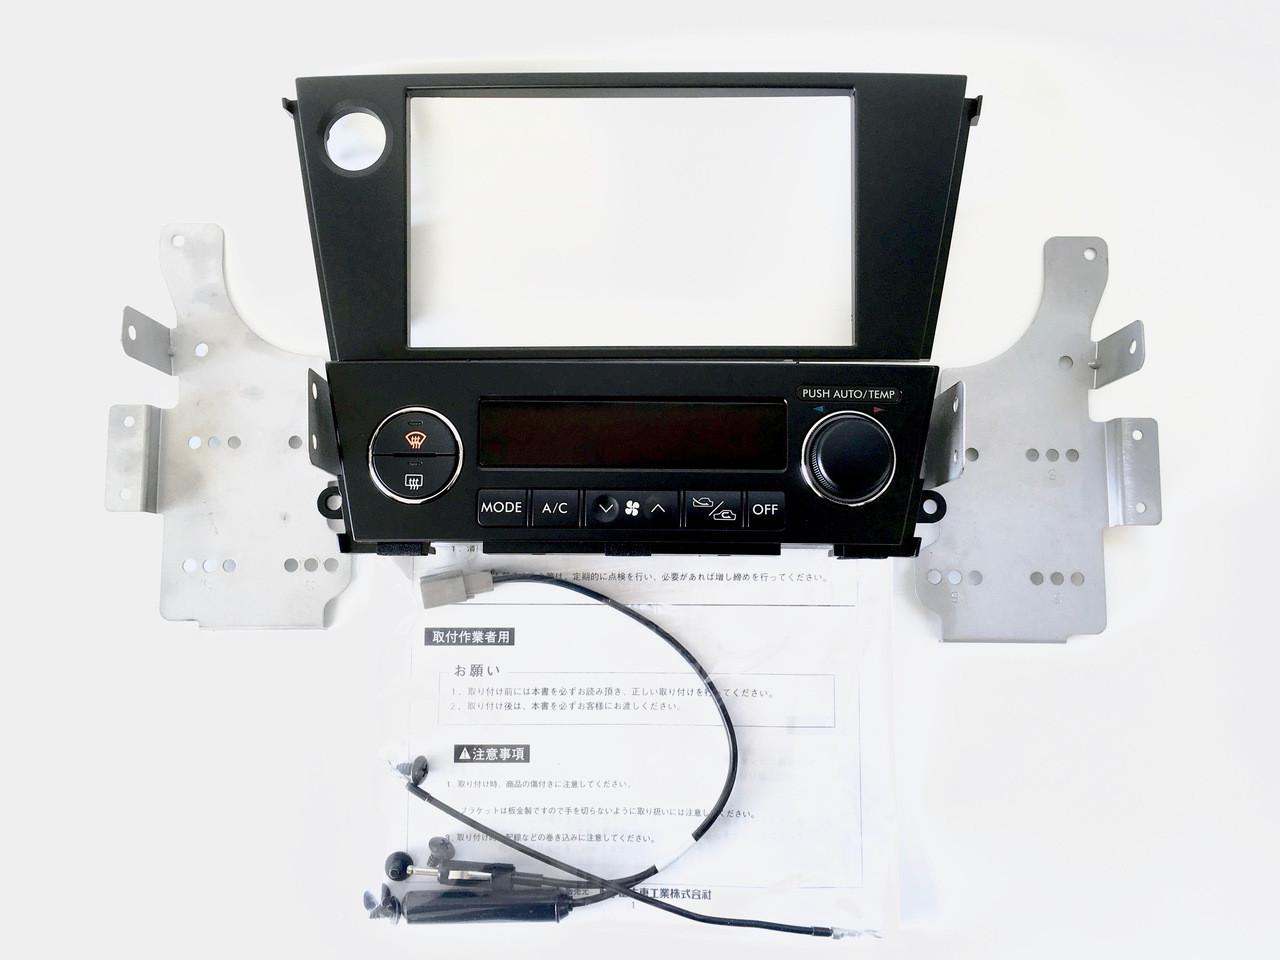 Subaru JDM H6217AG908SC Single Zone AV Panel set contents at AVOJDM